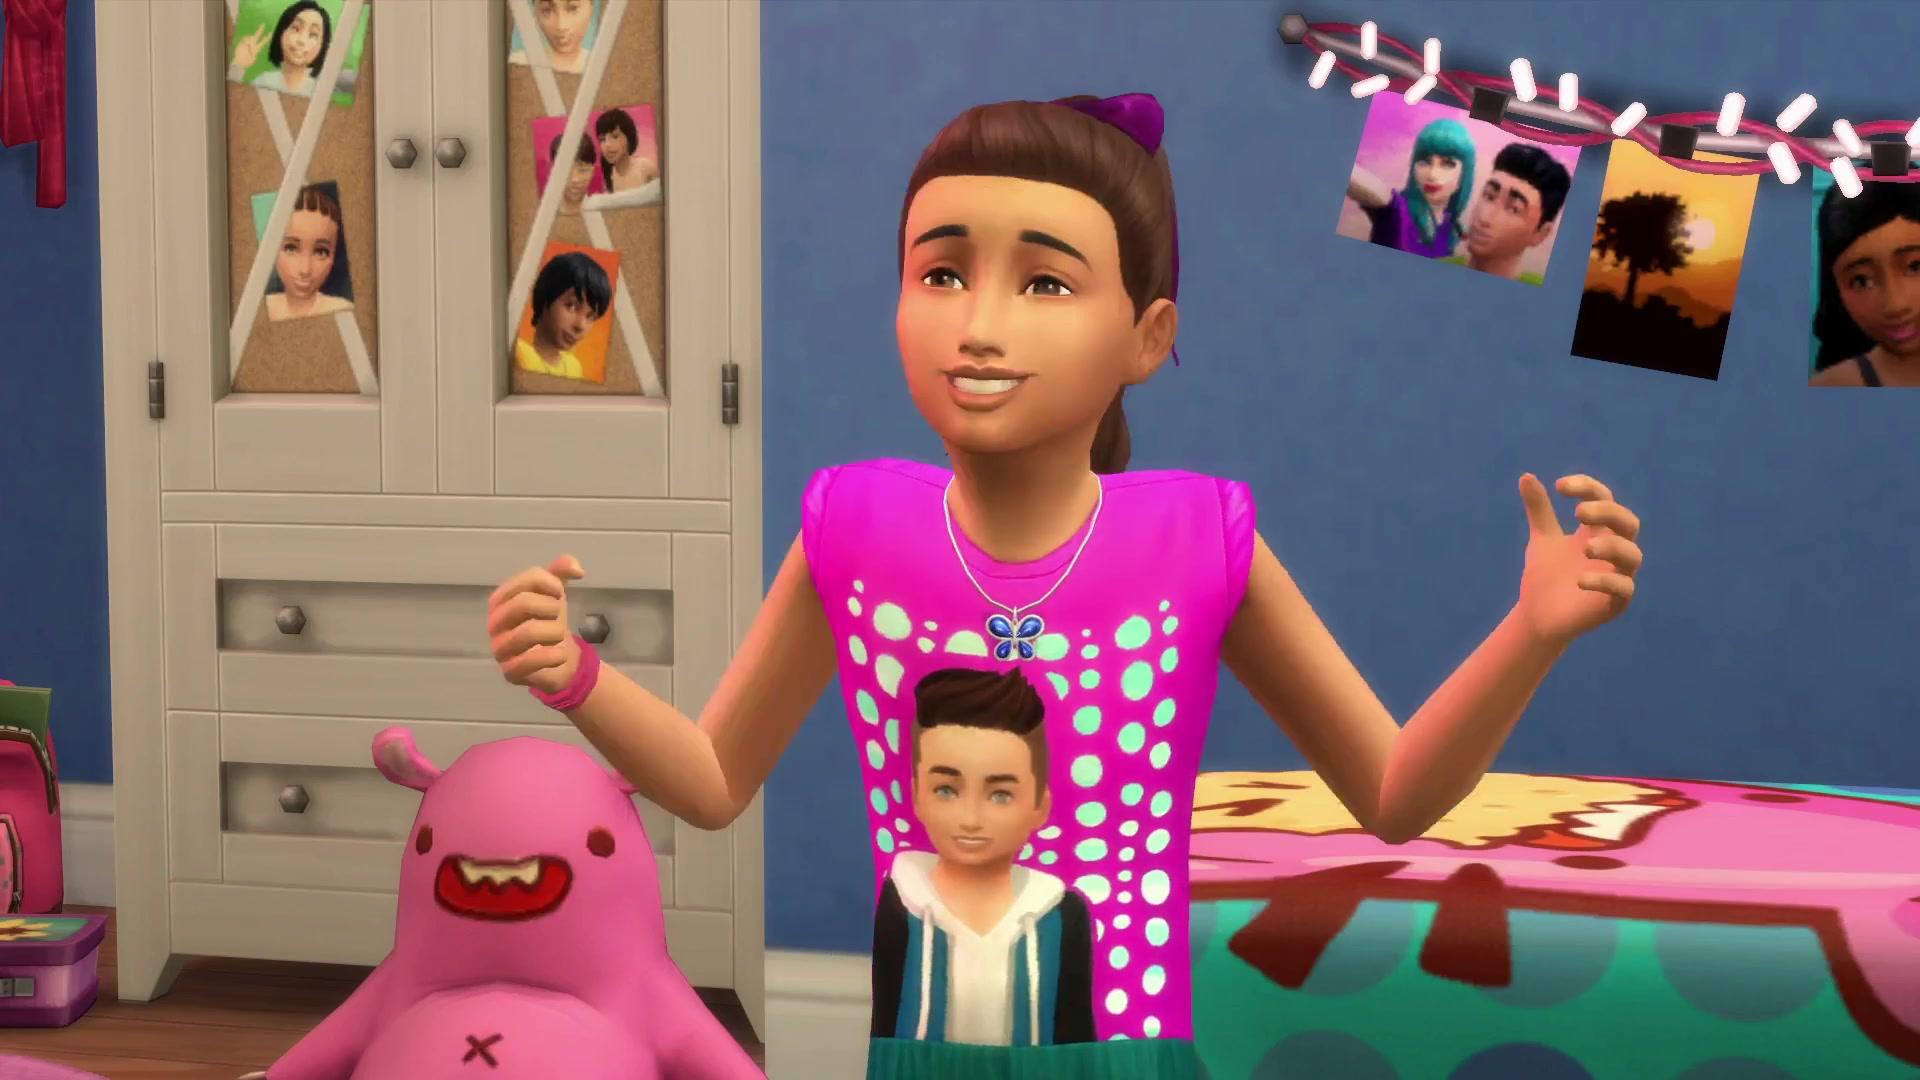 The Sims 4 Kids Room Stuff: 50 Trailer Screens